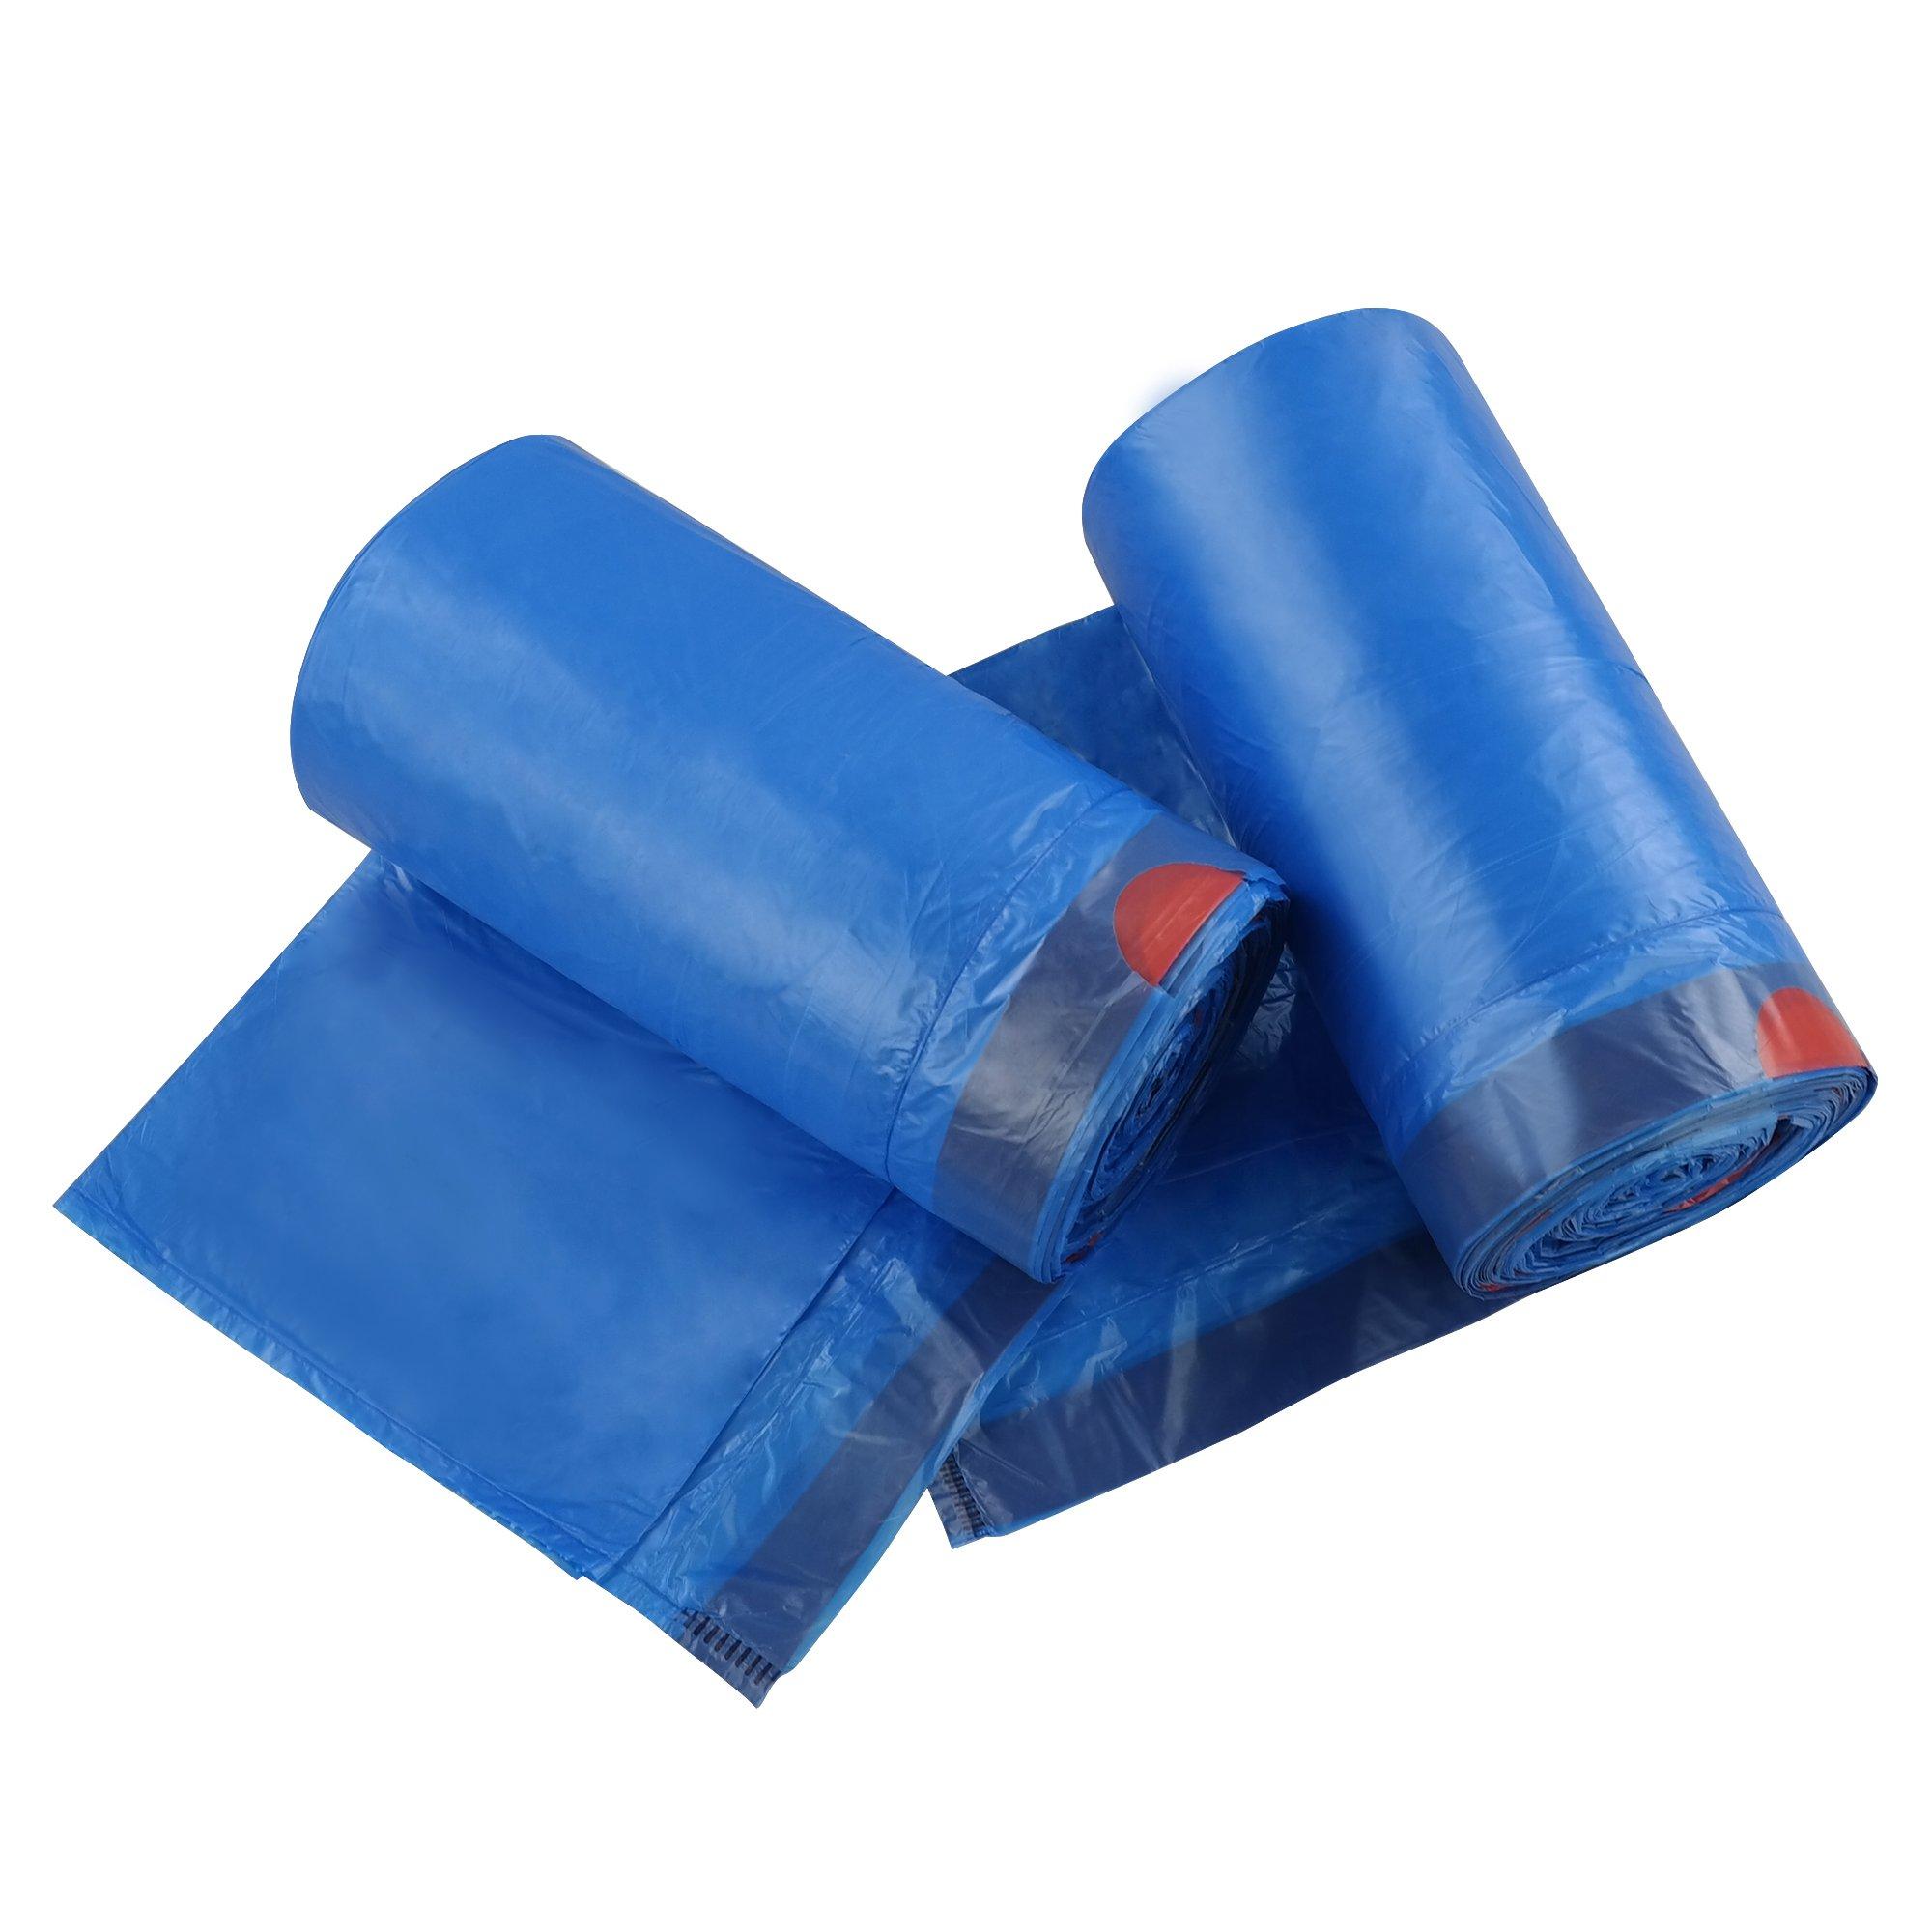 Fiaze 13 Gallon Drawstring Kitchen Garbage Bags (Blue, 110 Counts/2 Rolls)